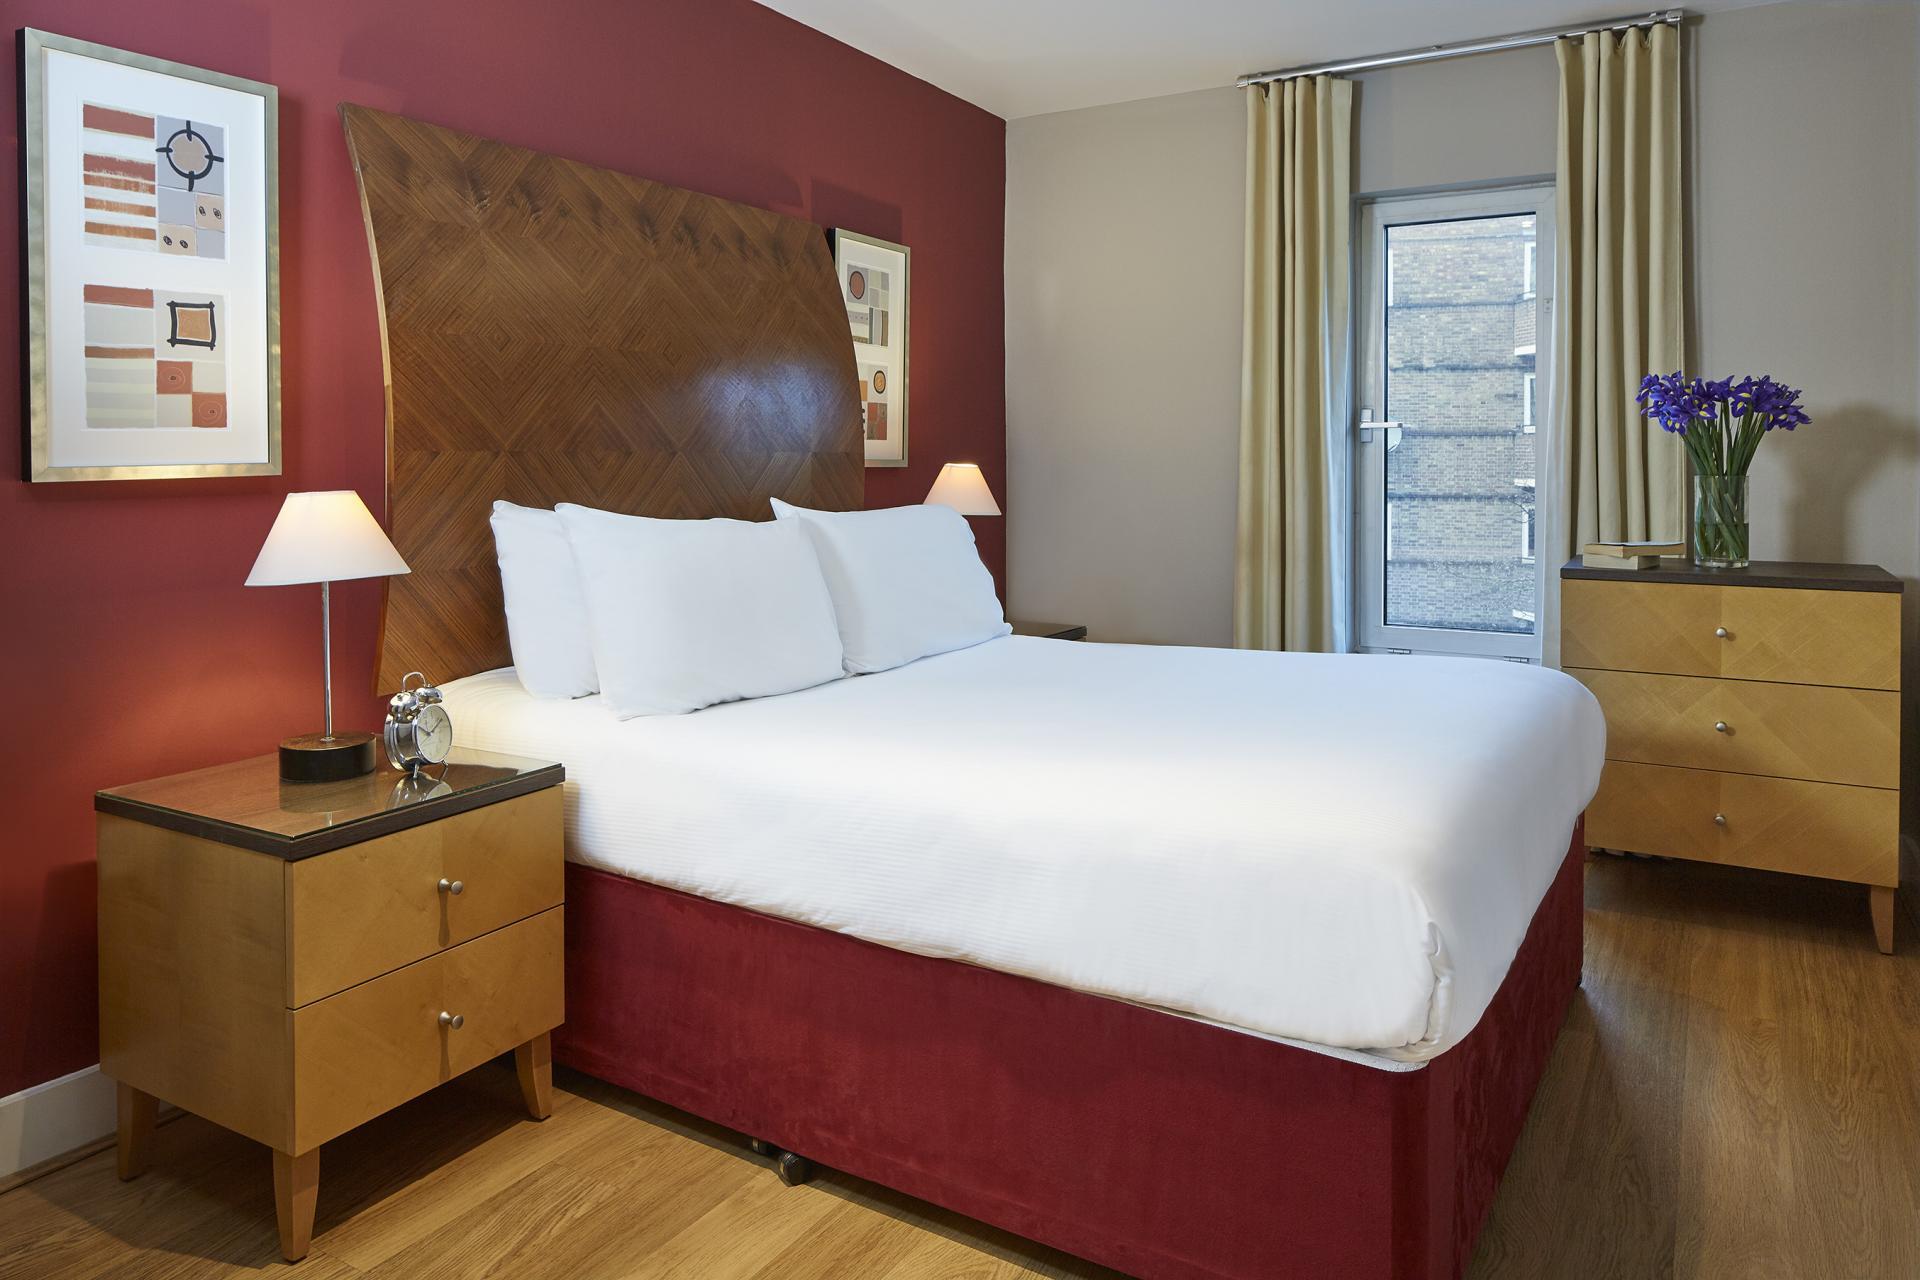 Bed at Empire Square Apartments, London Bridge, London